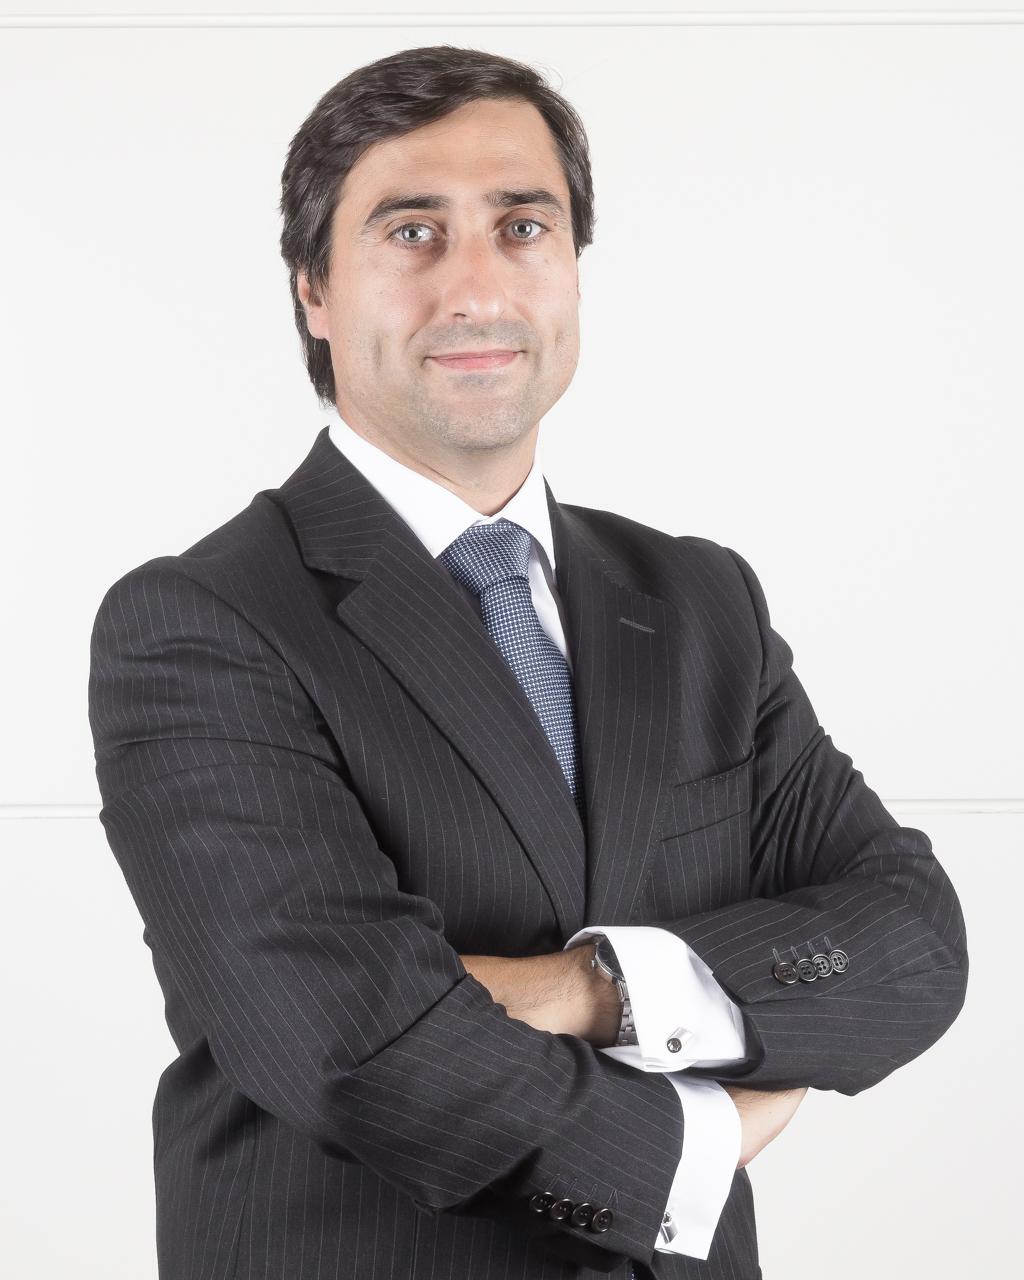 Artur Filipe da Silva